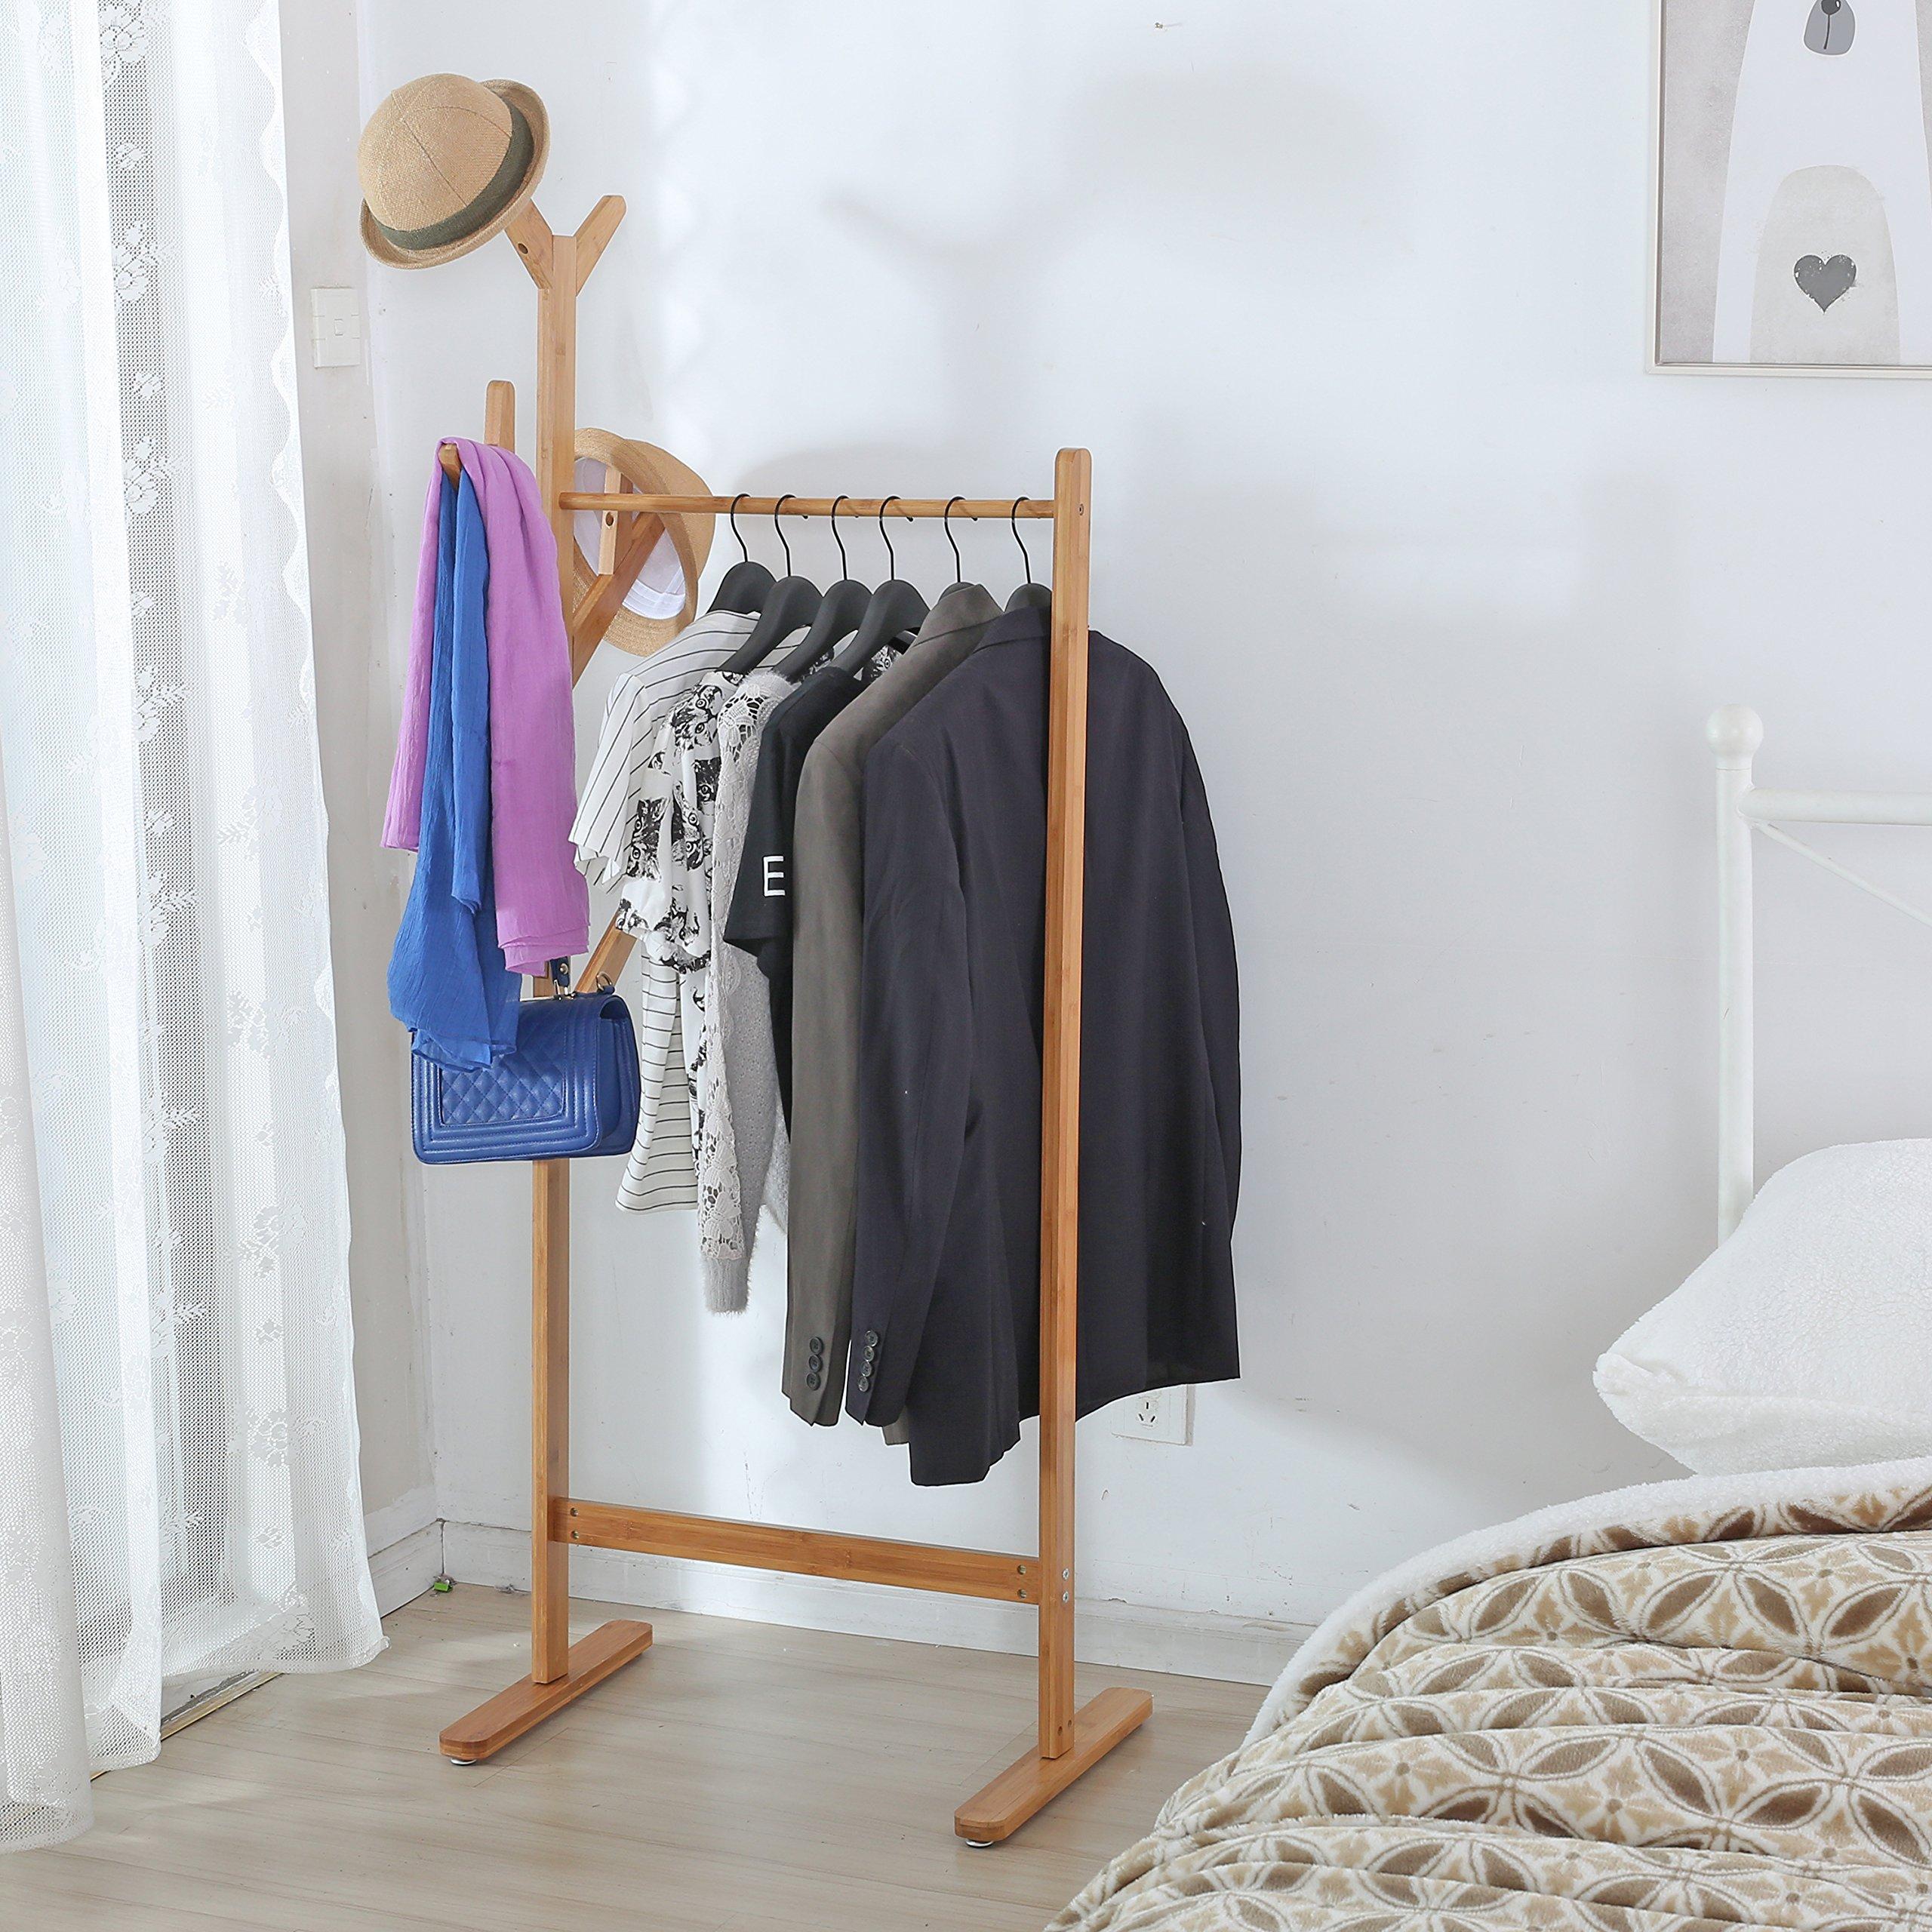 Freestanding Bamboo Wood Coat Rack, Entryway Hat Hooks Clothes Hanger Organizer